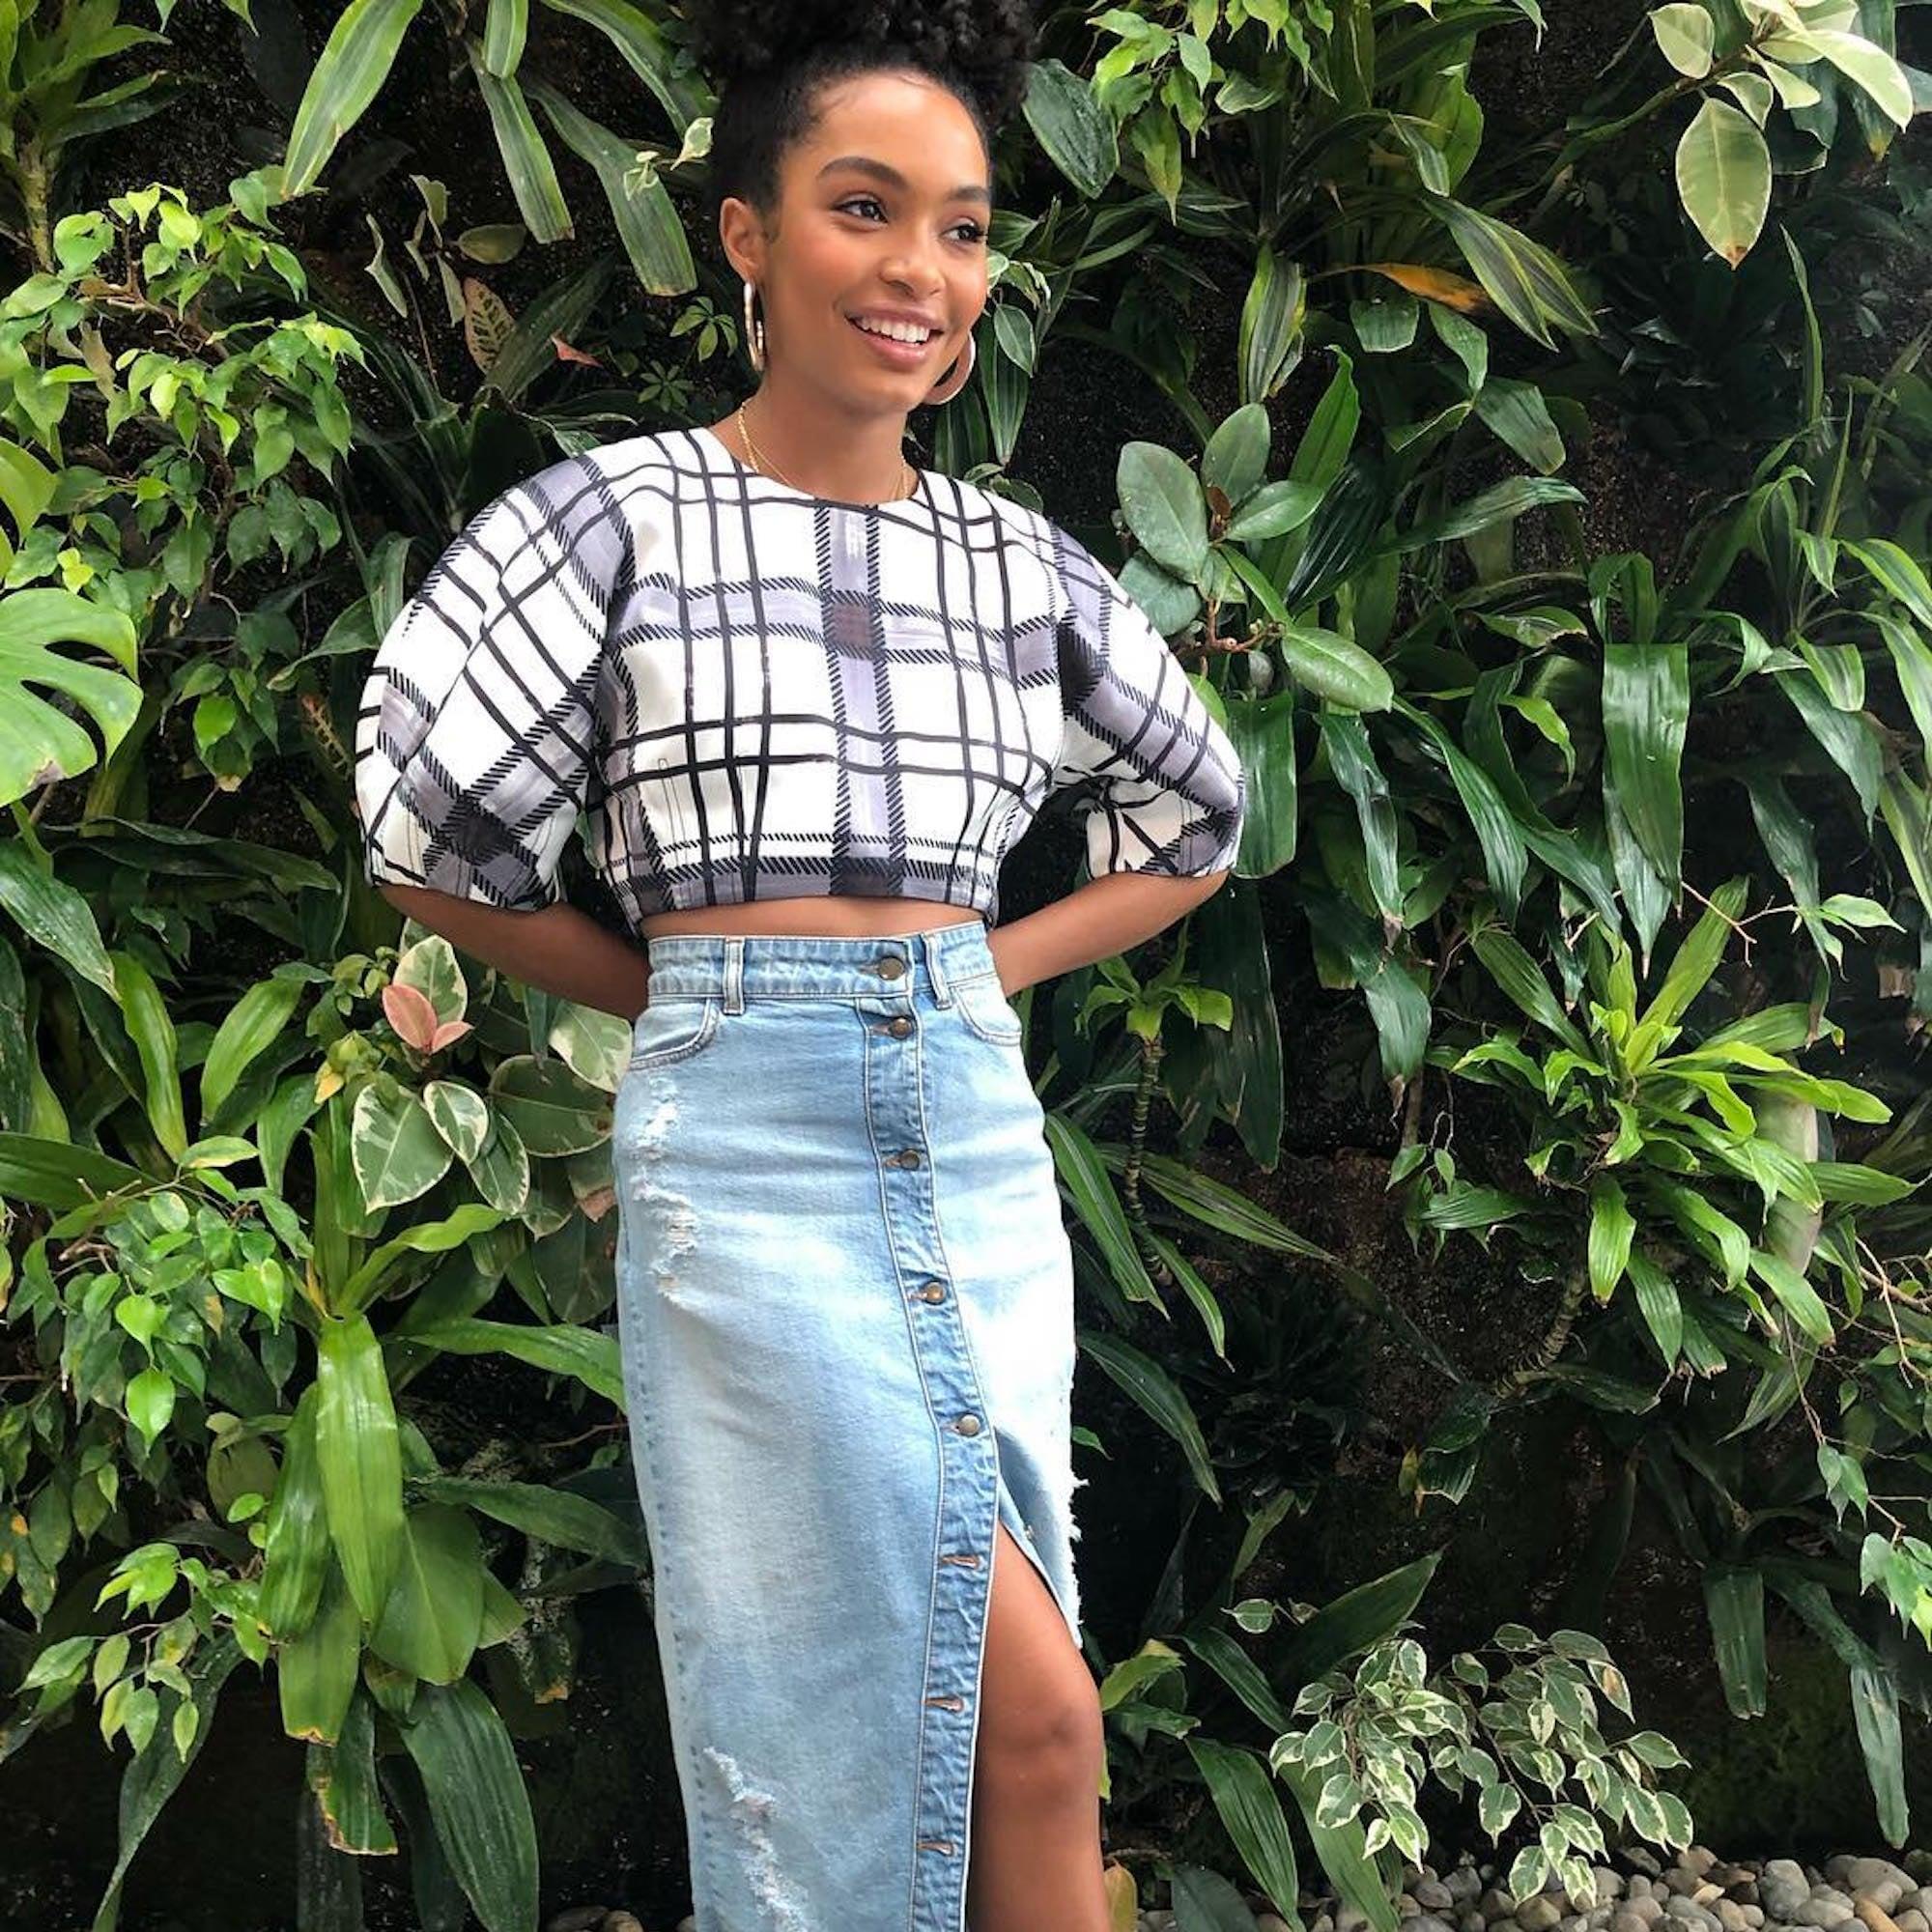 Denim Skirt Outfit Ideas 2019 Popsugar Fashion